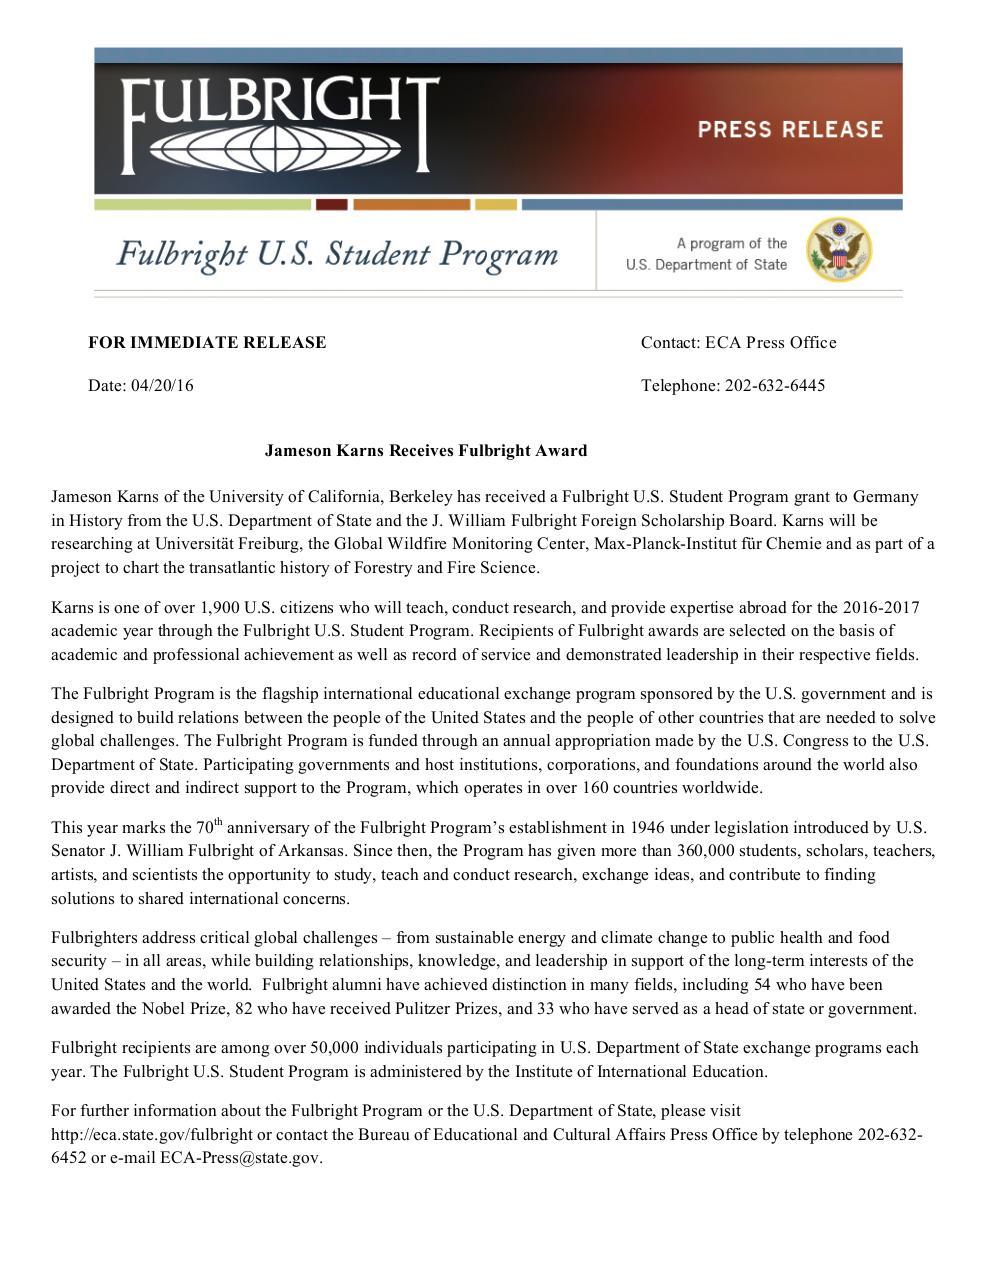 Karns 2016 Press Release Docx Fulbright Award Announcement Karns